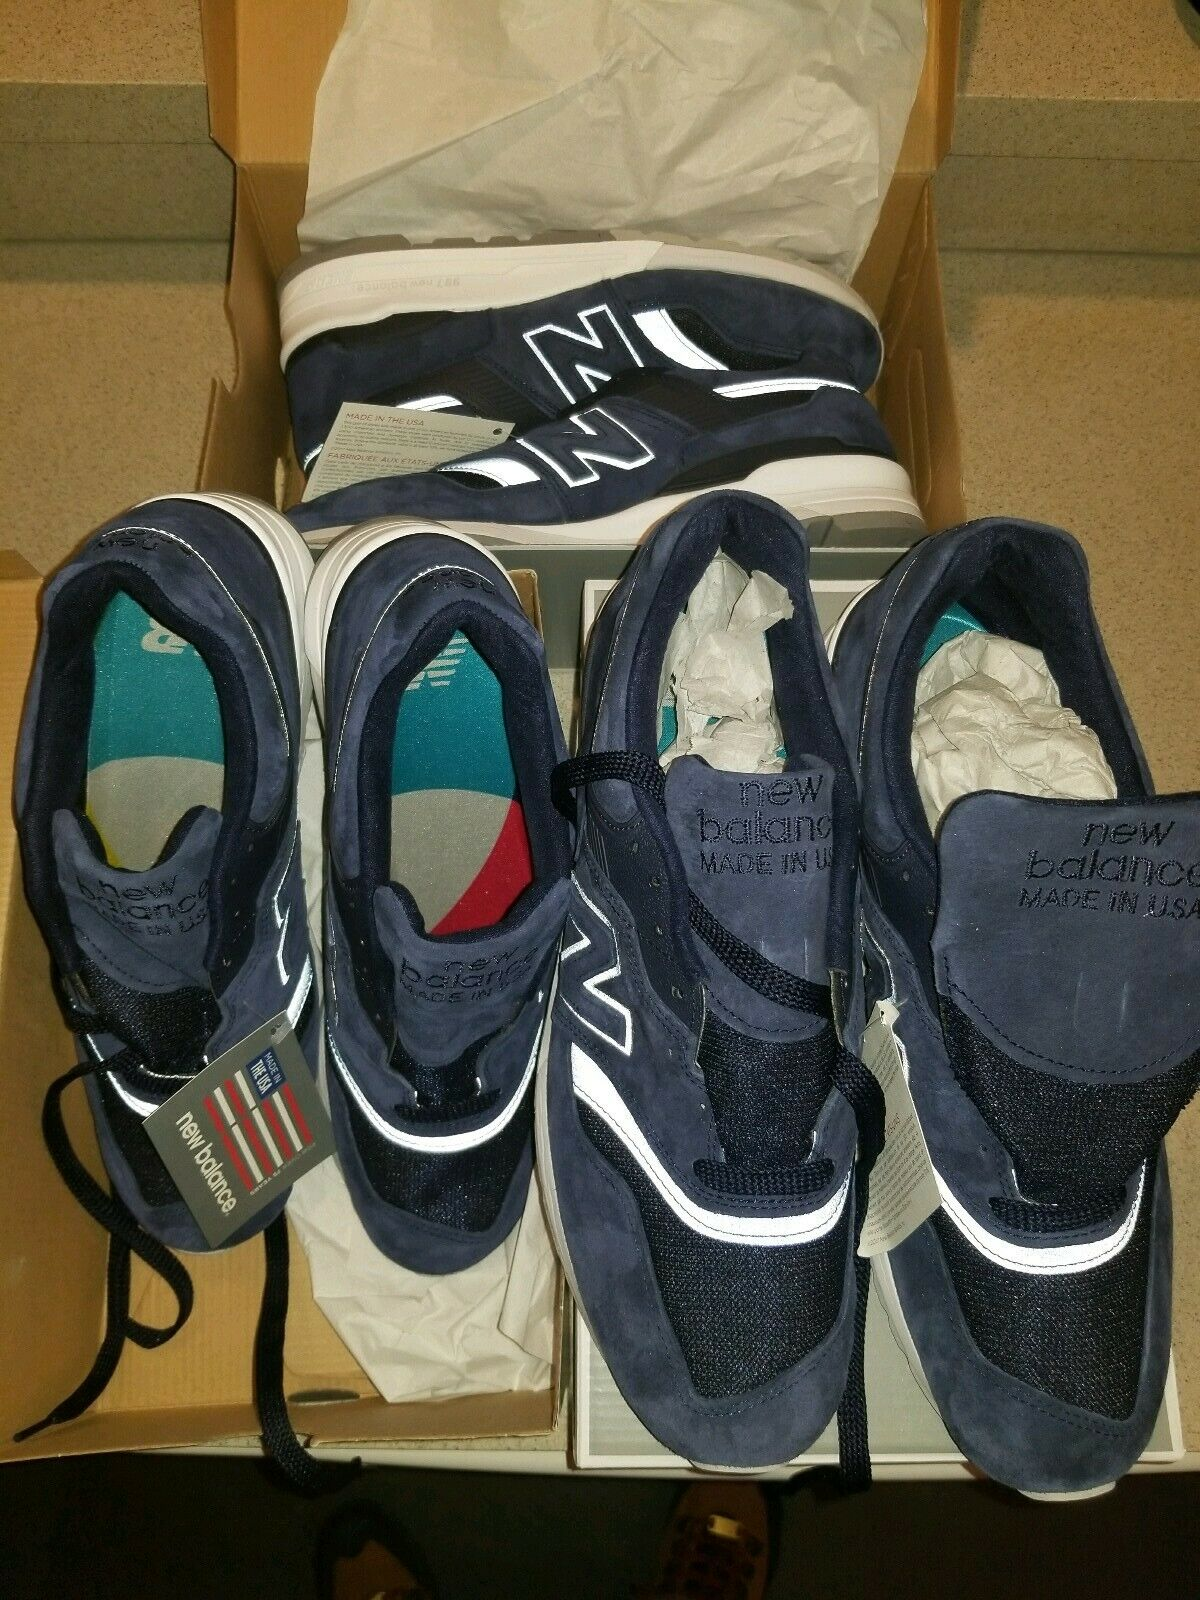 New balance 997 Athletic Running scarpe 3M Lifestyle scarpe da ginnastica Cross-Trainer 998 11